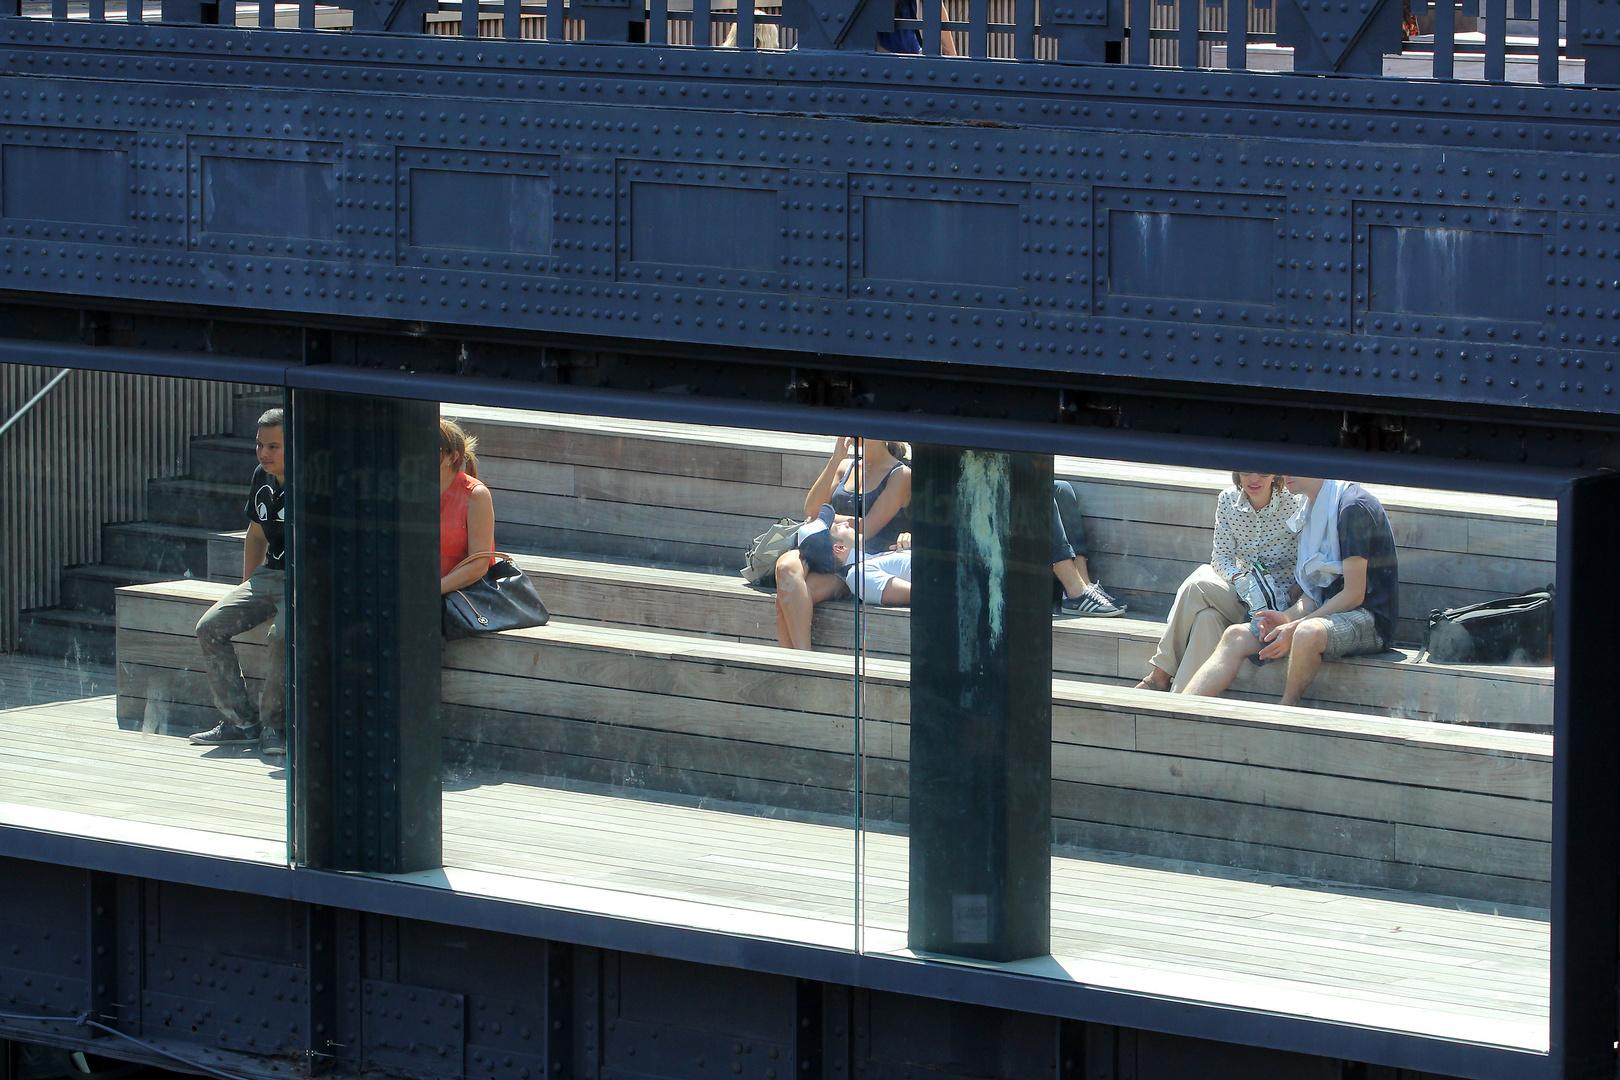 A Window on Happiness - Ney York City, Aug 28, 2013